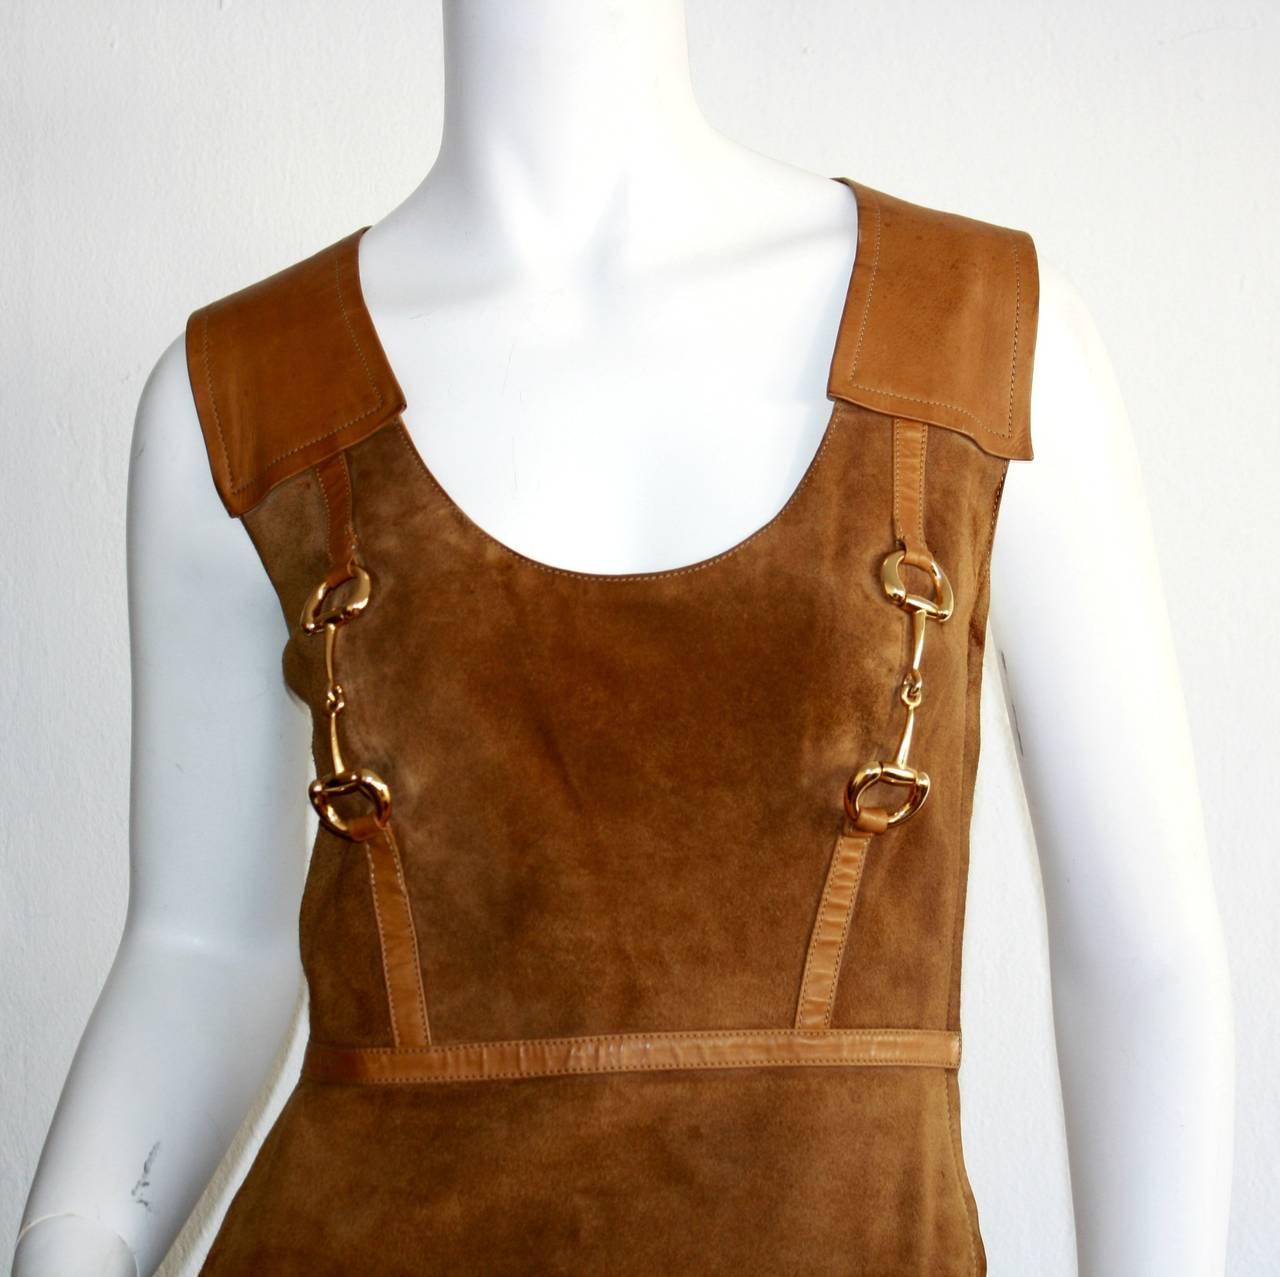 Rare Vintage 1960s Gucci Tan Leather Horsebit A - Line Space Age Dress 2